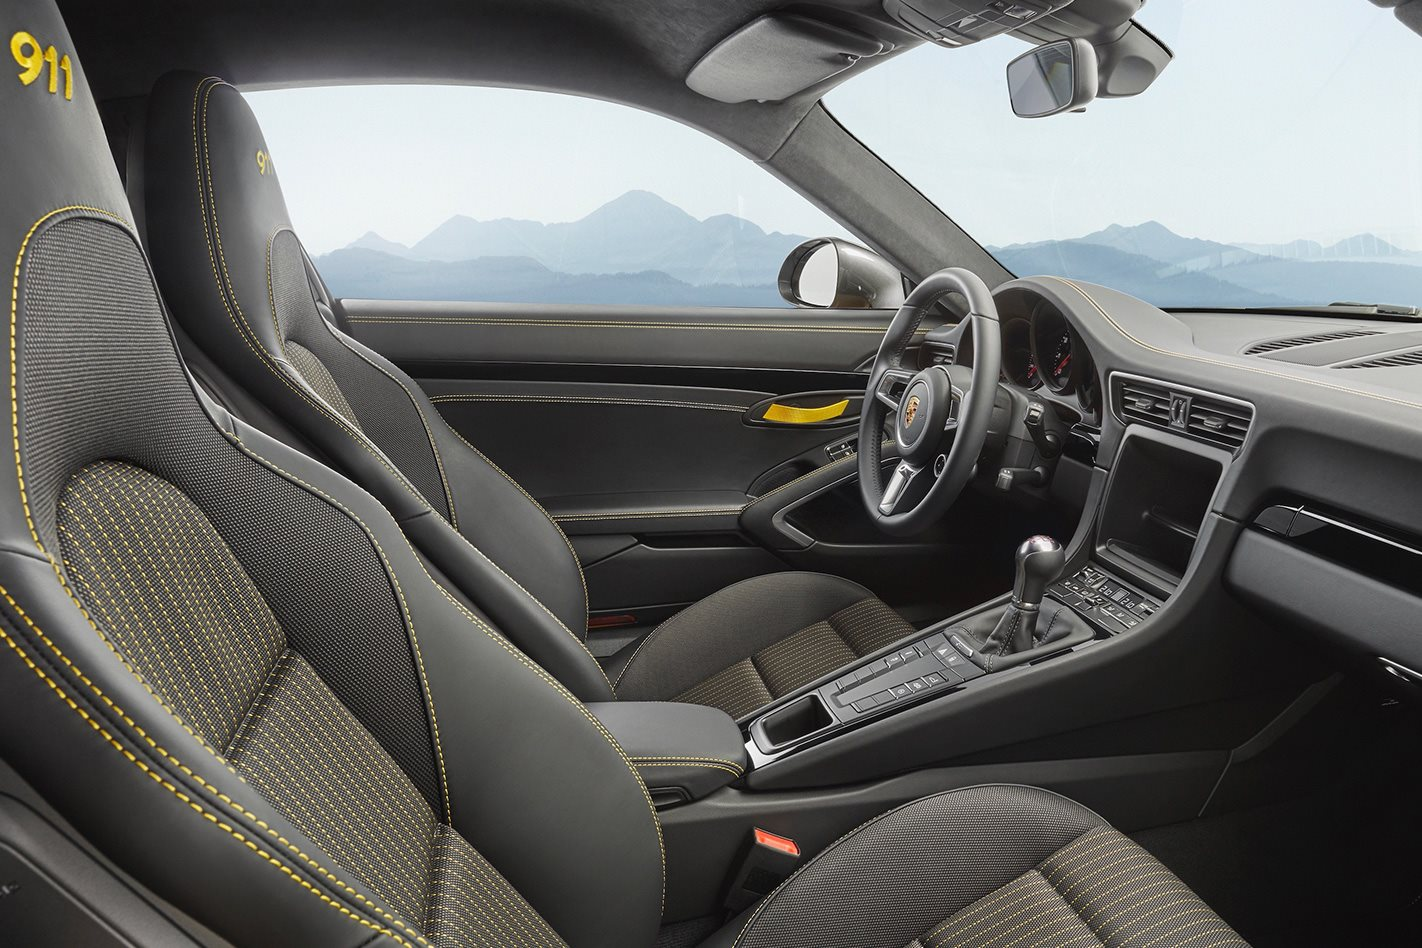 2018-Porsche-911-Carrera-T-interior.jpg